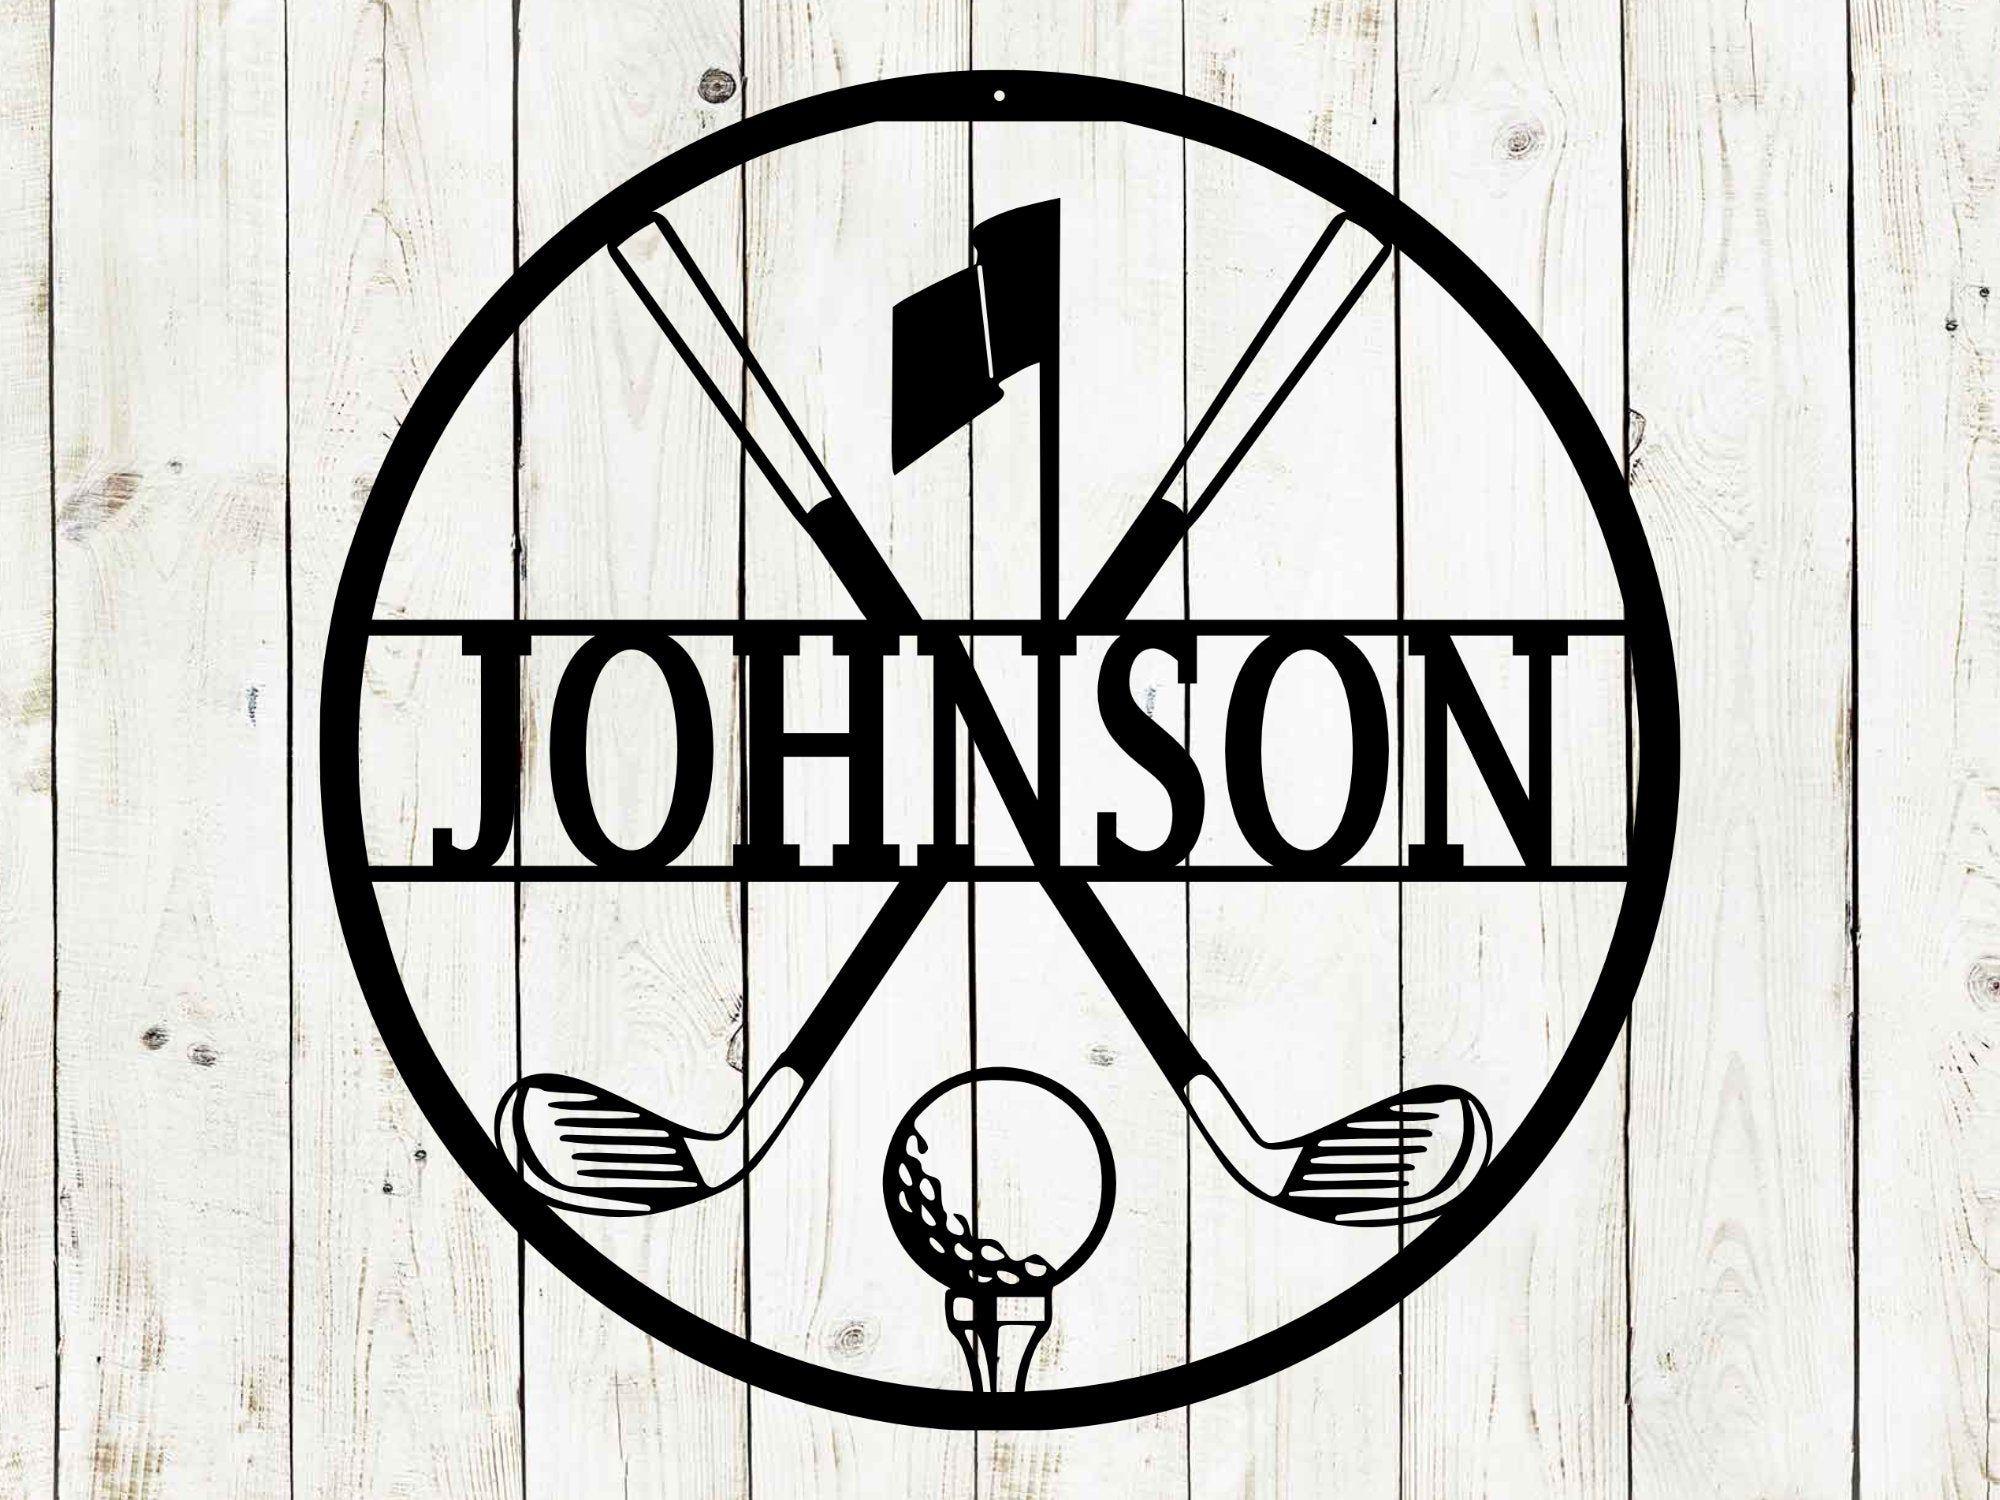 Golf Custom Name Metal Sign, Golf Sign, Bar Sign, 19th Hole, Custom Golf Sign, Man Cave, Home Bar, Game Room Sign, Fathers Day, Golf